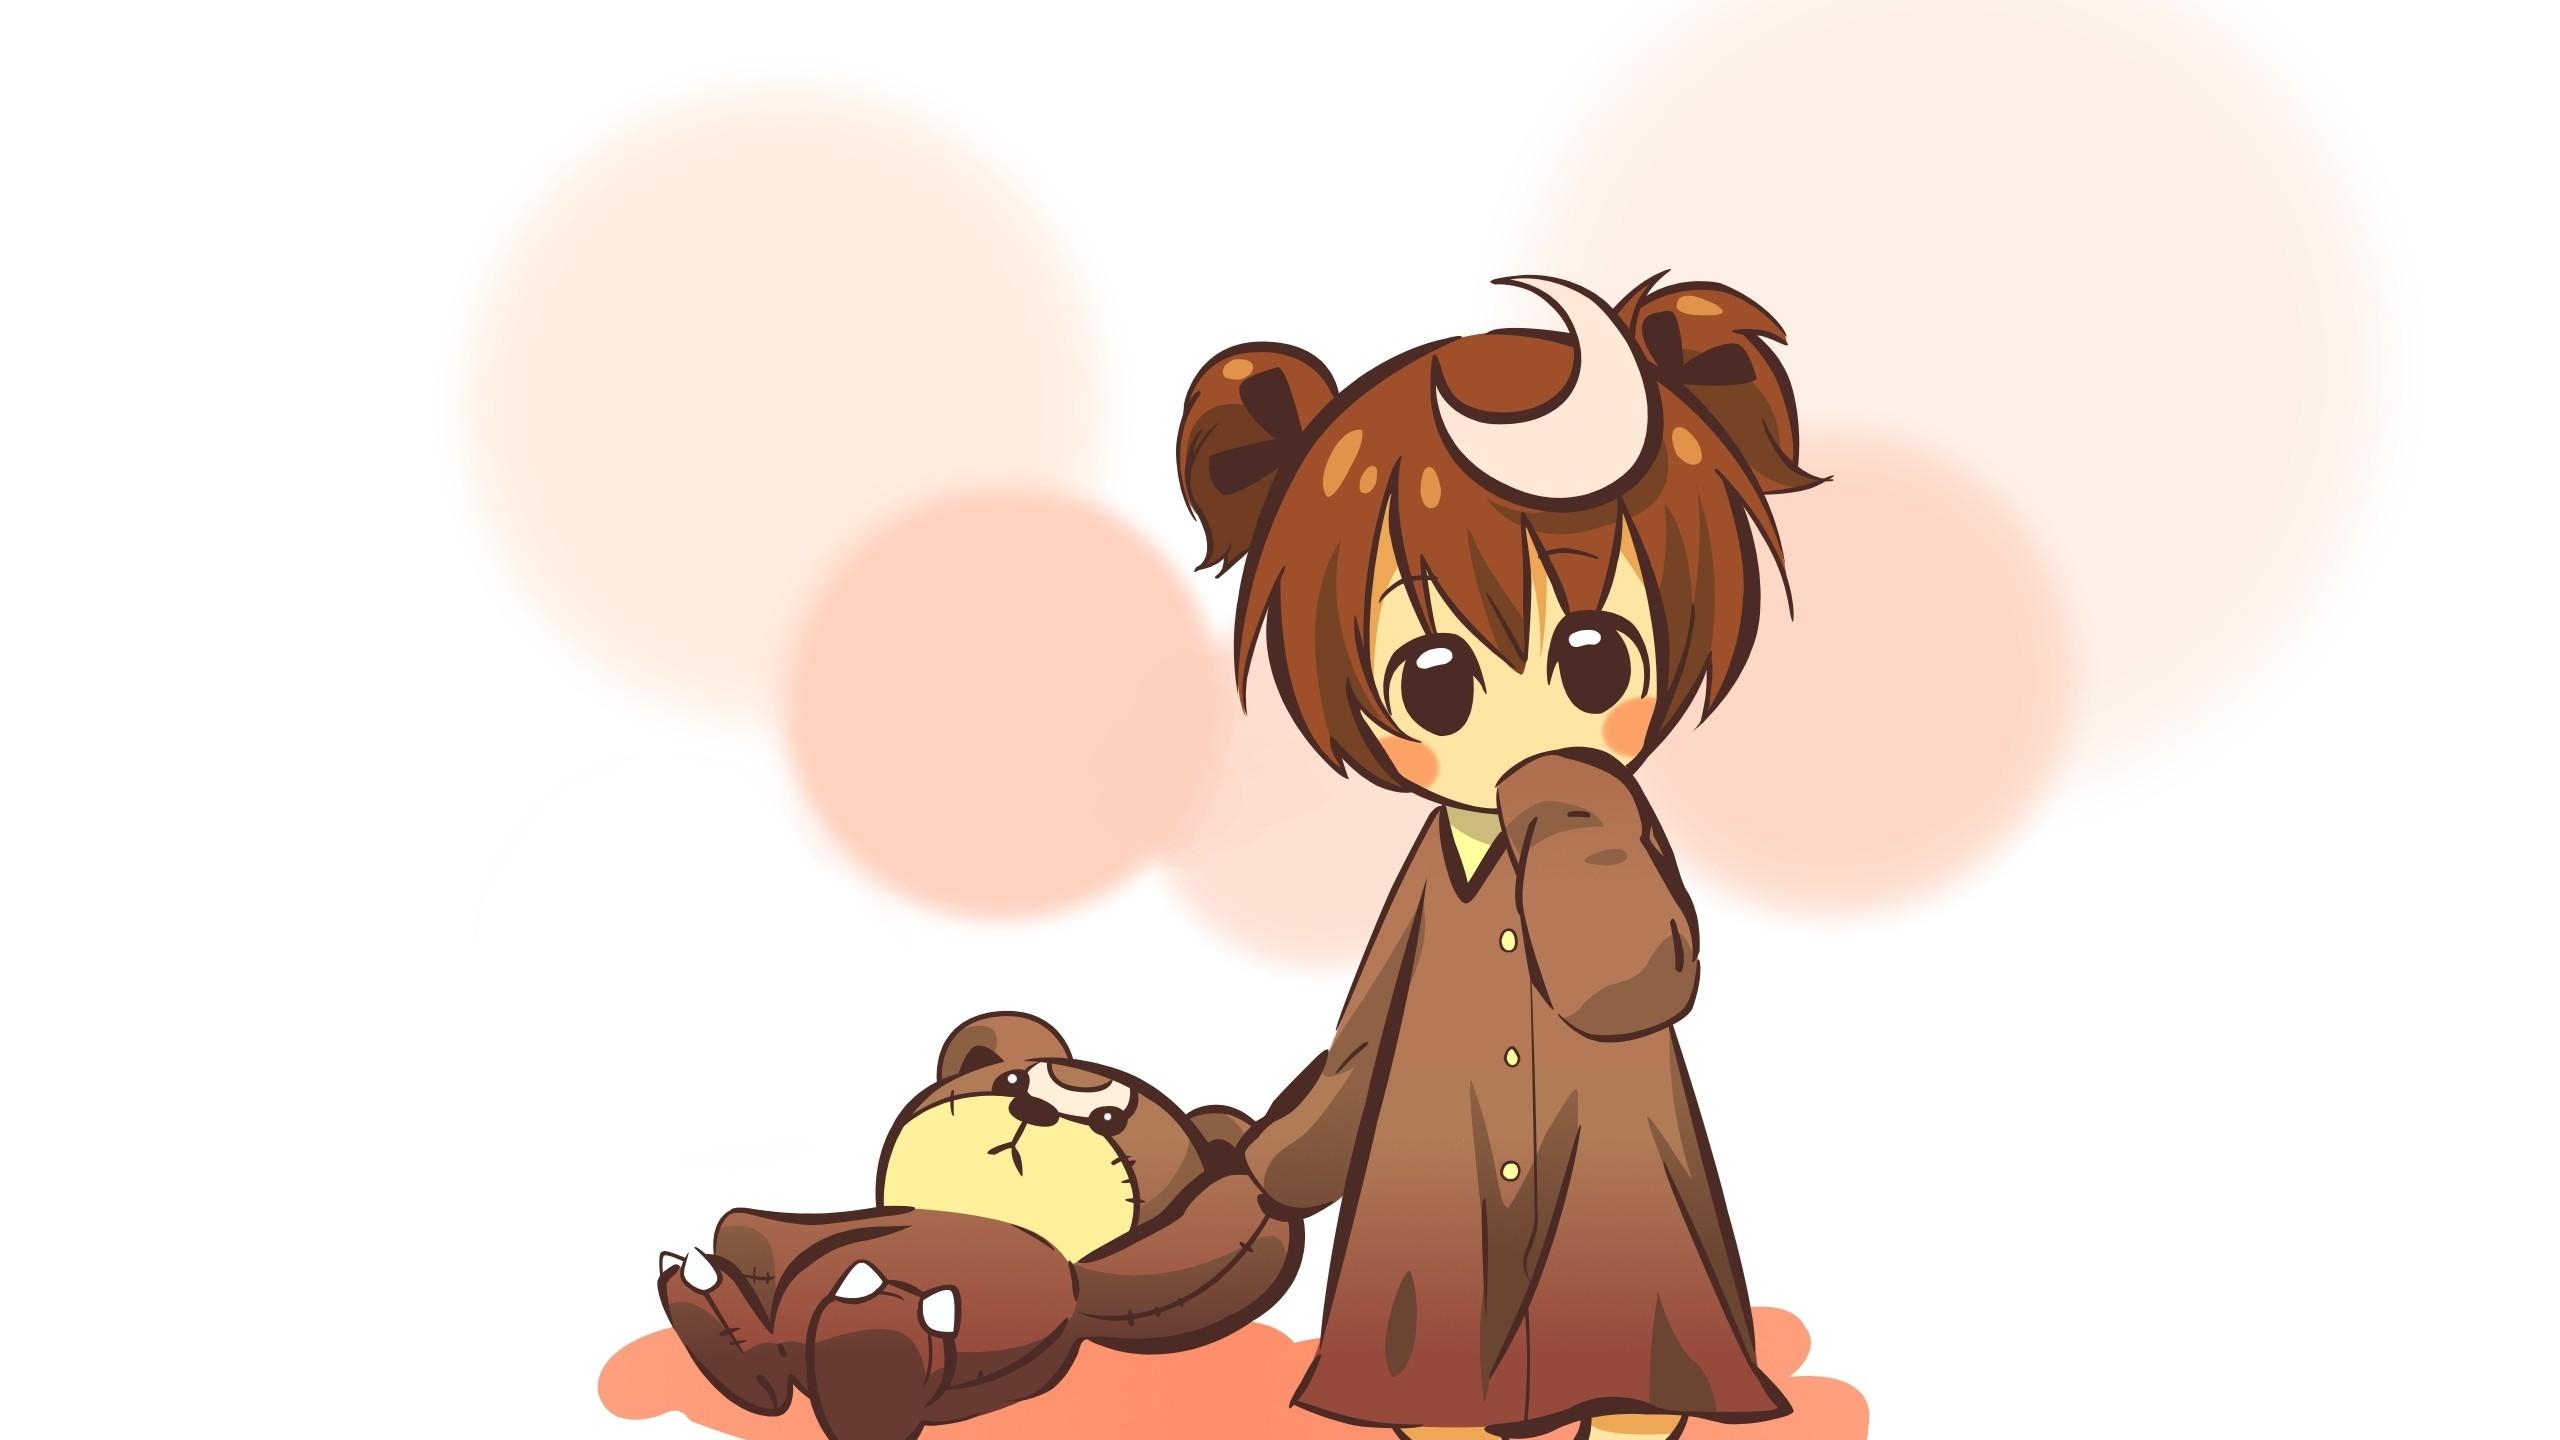 Wallpaper anime, girl, cute, toy, bear, background